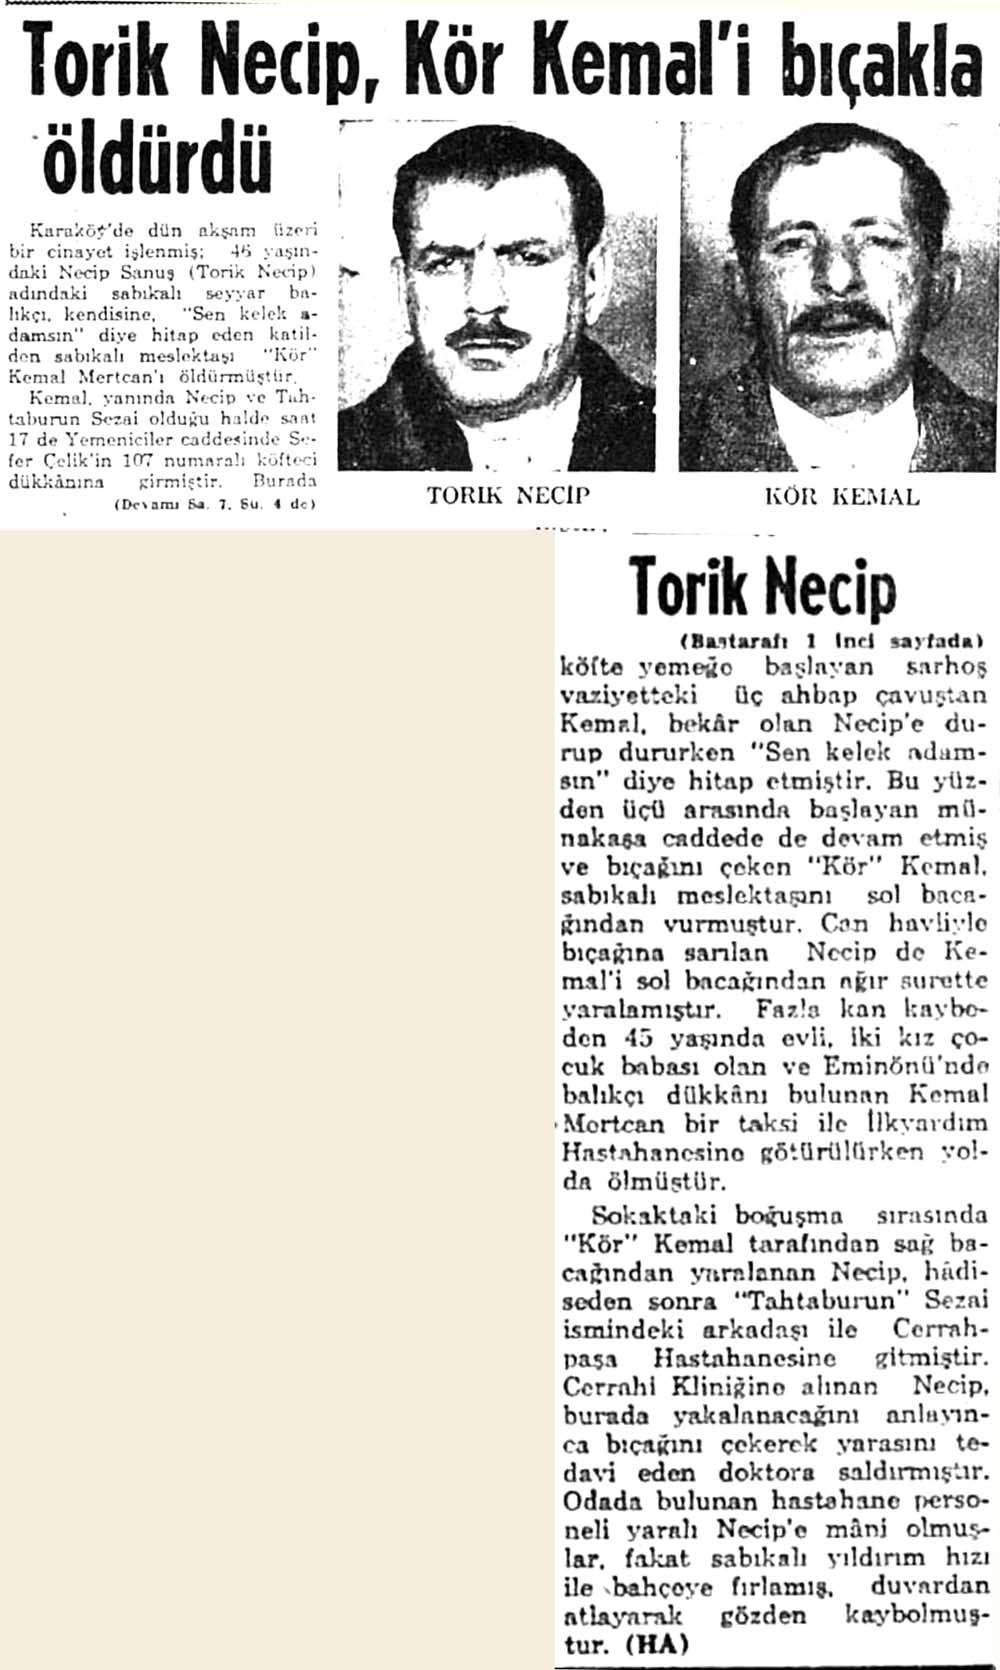 Torik Necip, Kör Kemal'i bıçakla öldürdü